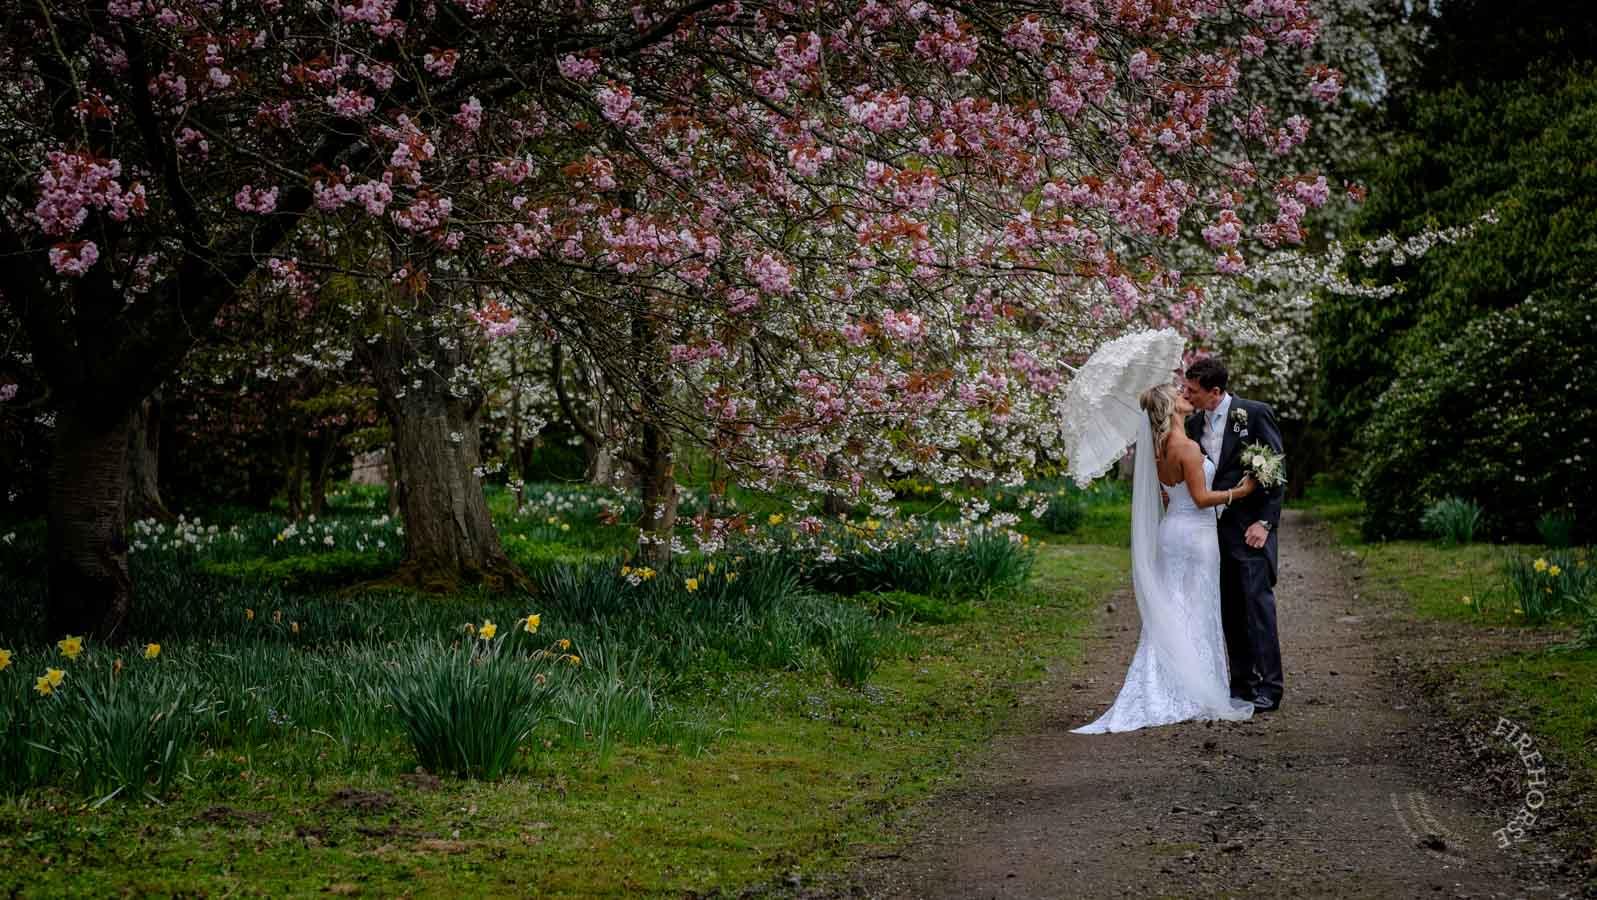 Swinton-Park-Spring-Wedding-240